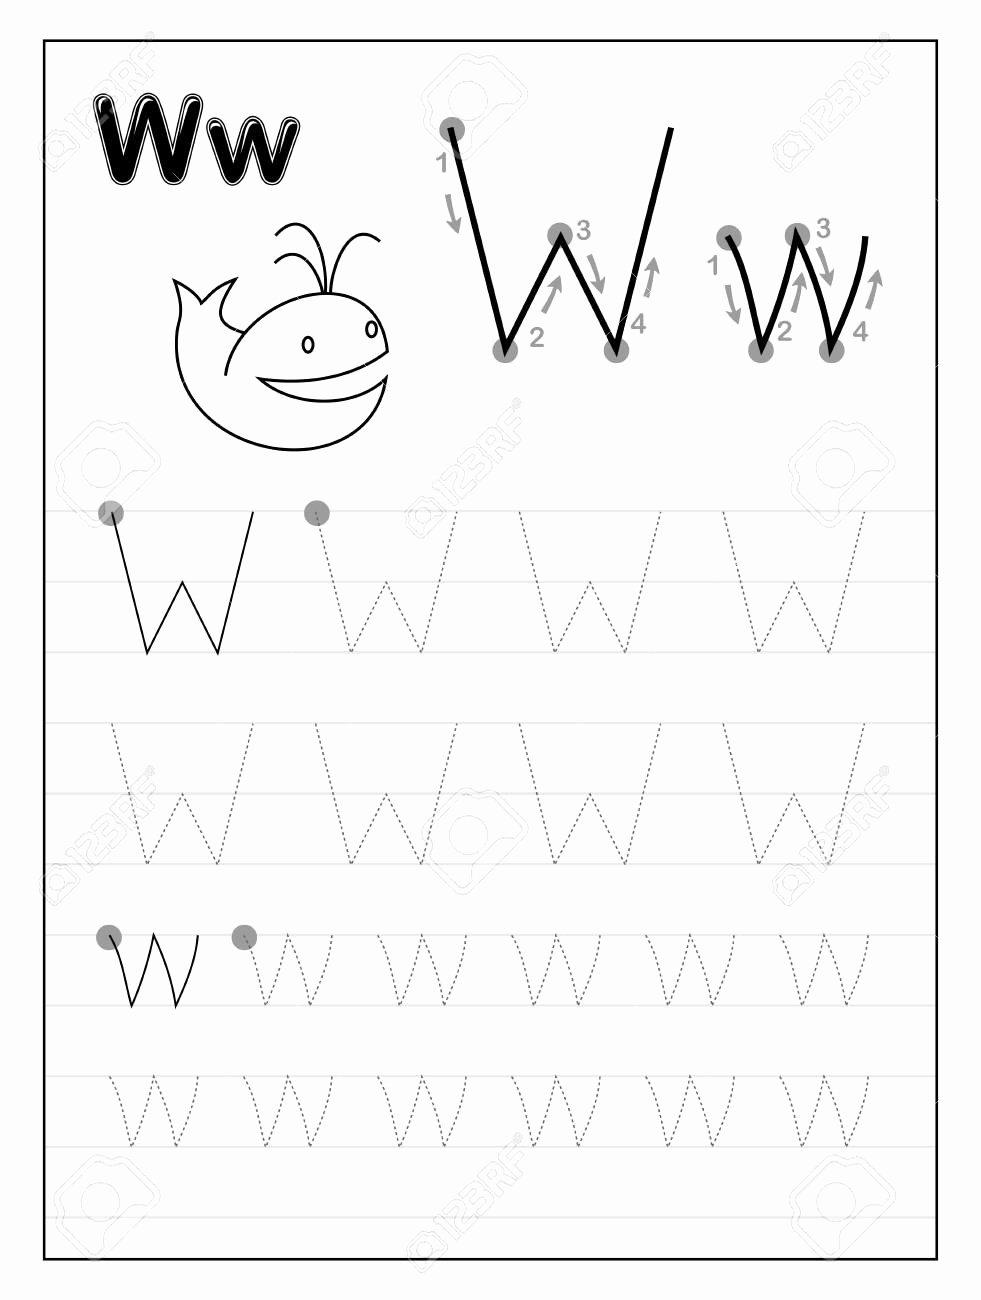 Letter W Worksheets for Preschoolers Kids Worksheet Dotted Alphabet Worksheets Worksheet Ideas